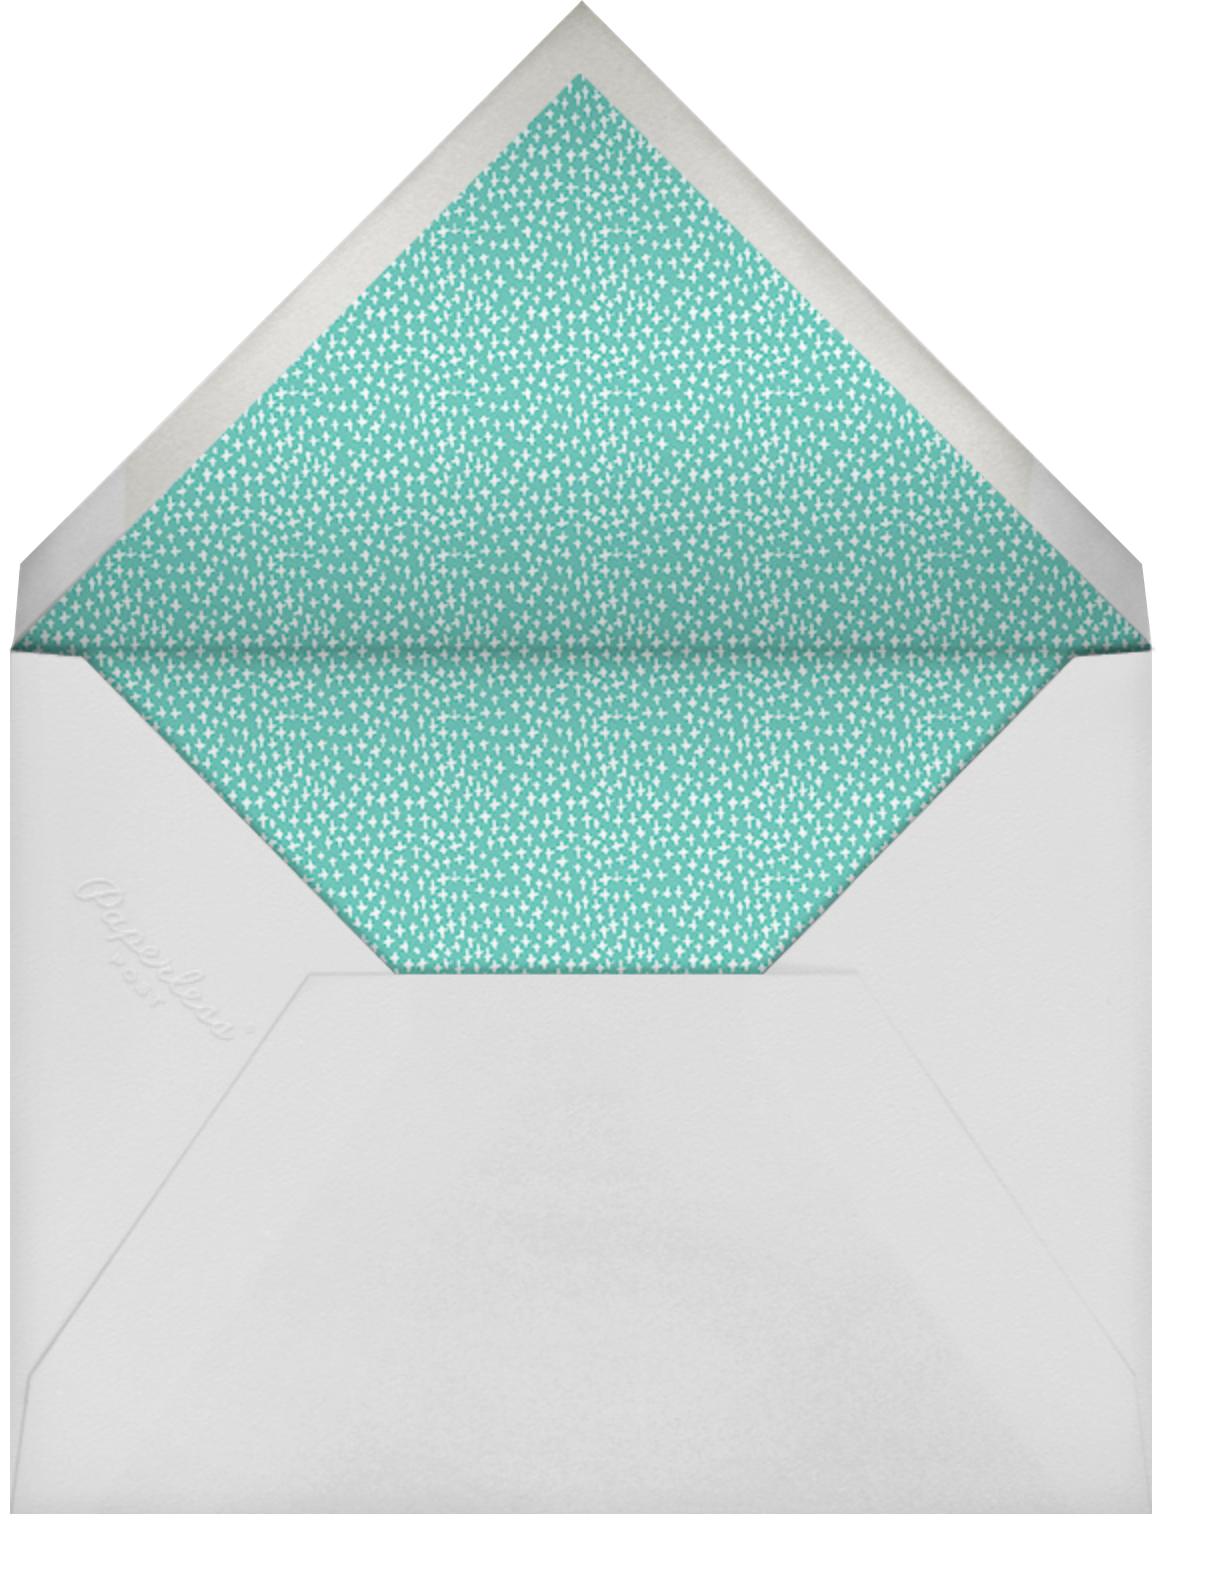 Just a Bite, I'm Stuffed - Mr. Boddington's Studio - Kids' birthday - envelope back